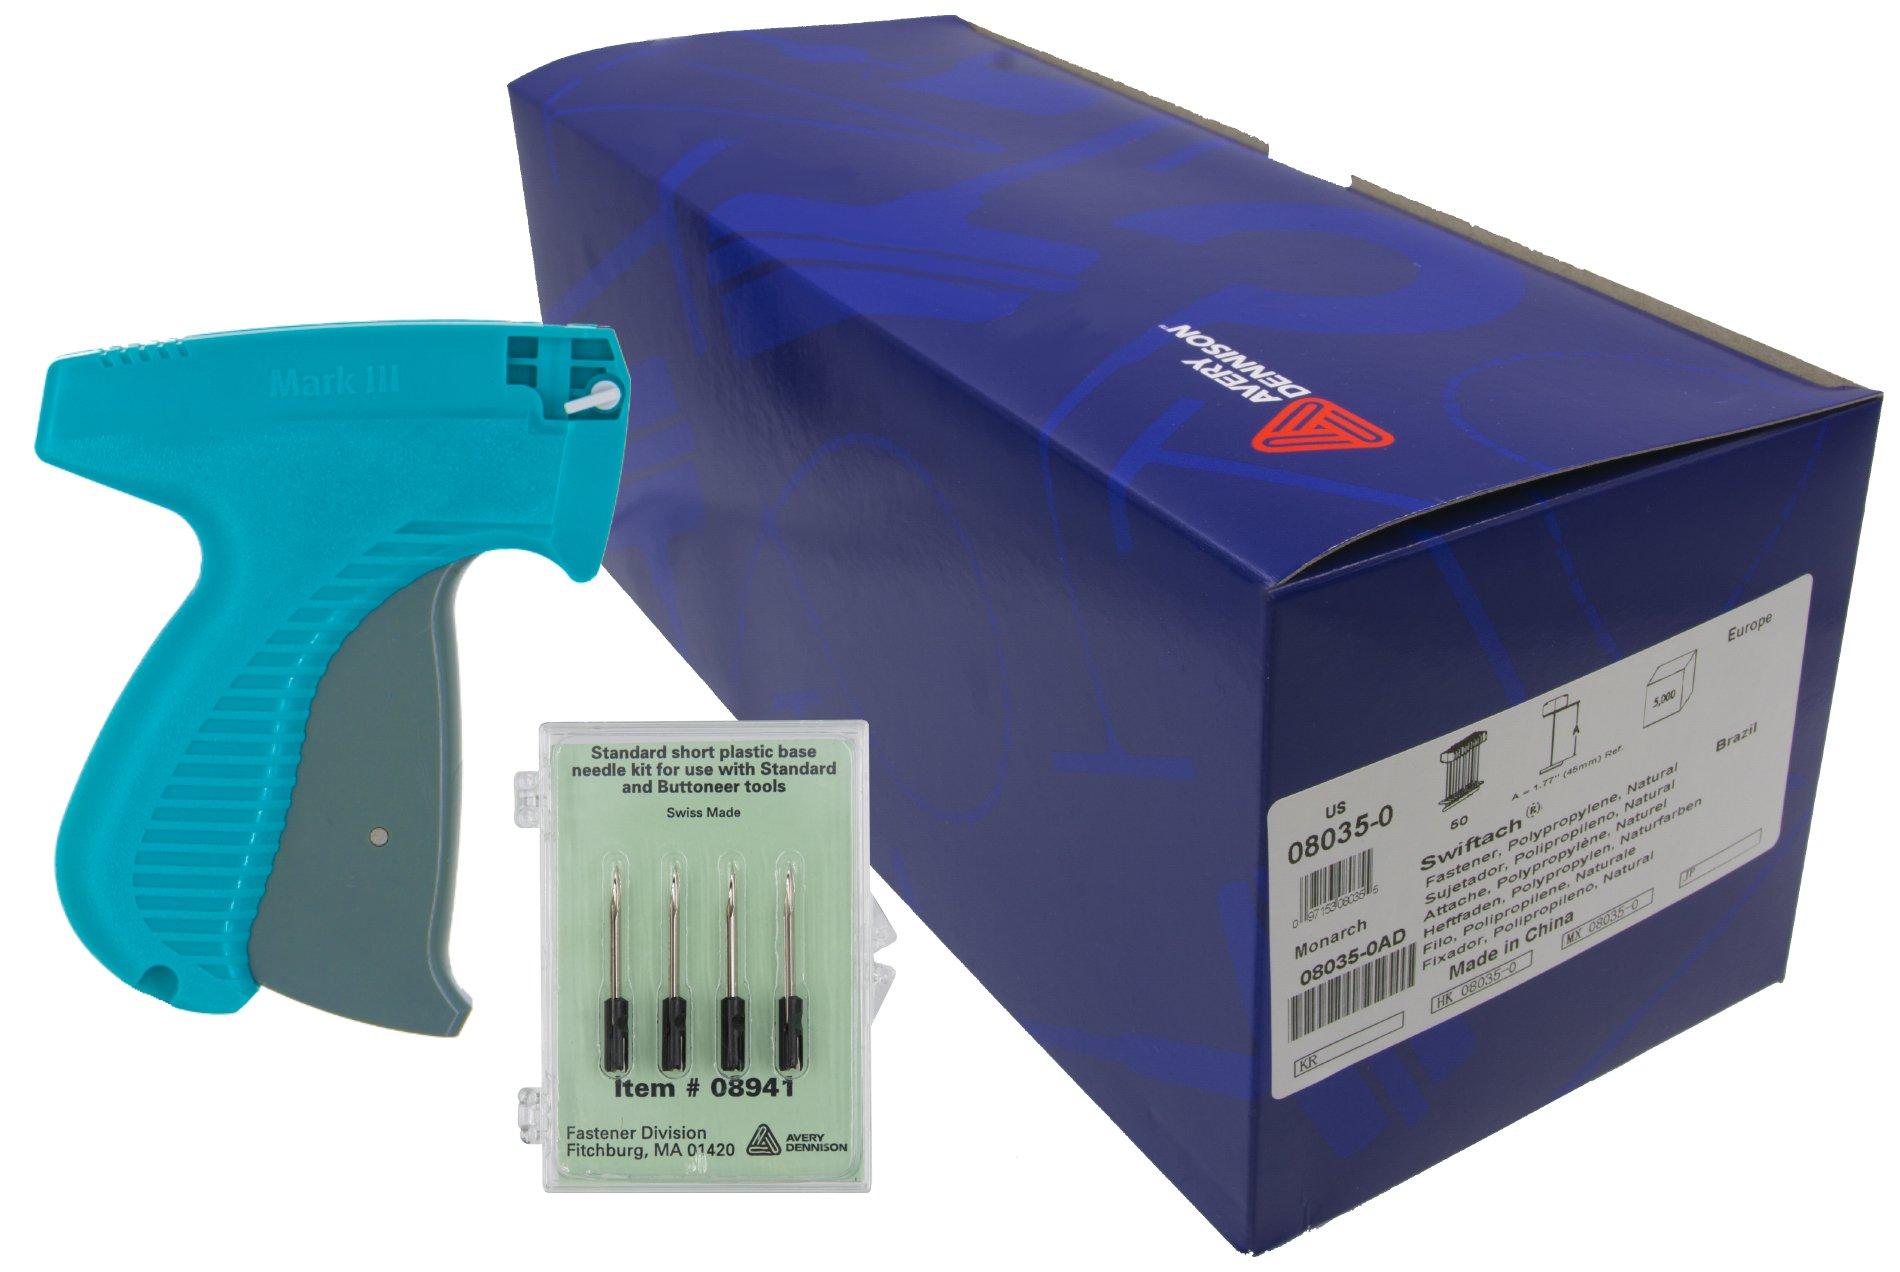 Avery Dennison Mark III Tagging Gun Kit - Includes Mark III 10651 Regular Tagging Gun, 5.000 2'' Avery Dennison Fasteners / Barbs & 4 Avery Dennison Replacement Needles – ALL GENUINE AVERY DENNISON